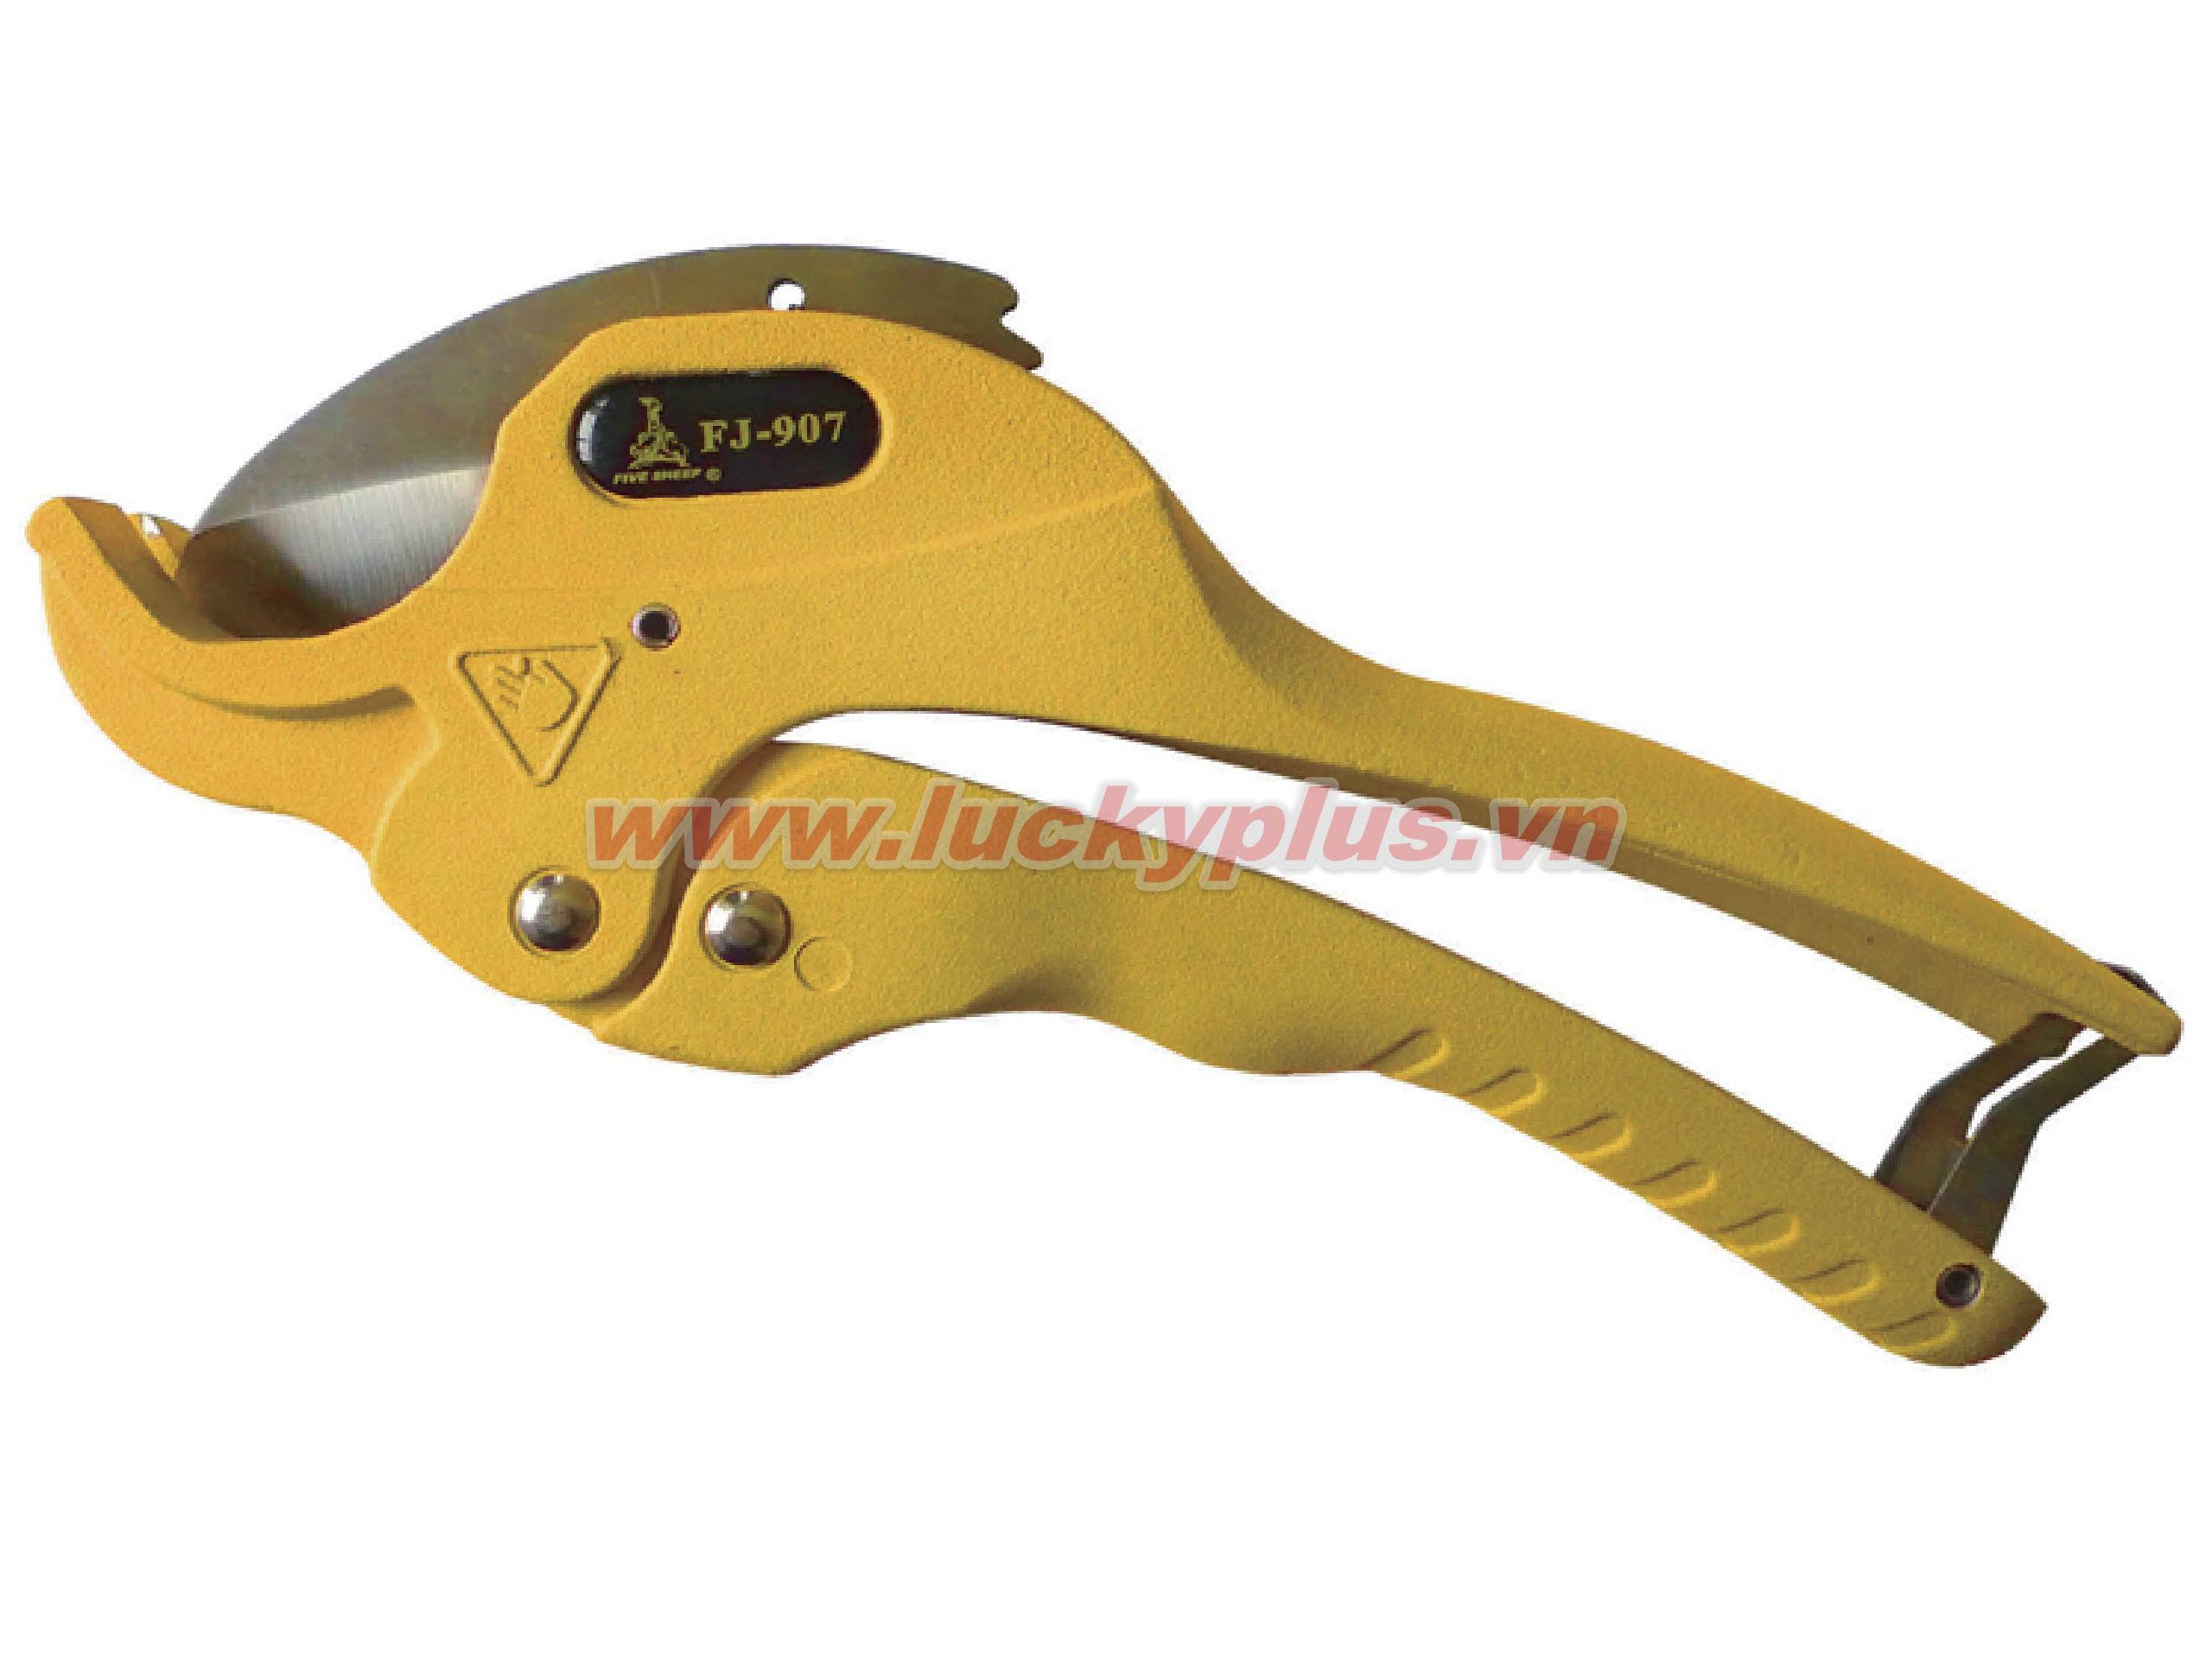 Dao cắt ống nhựa FiveSheep FJ-907 32mm